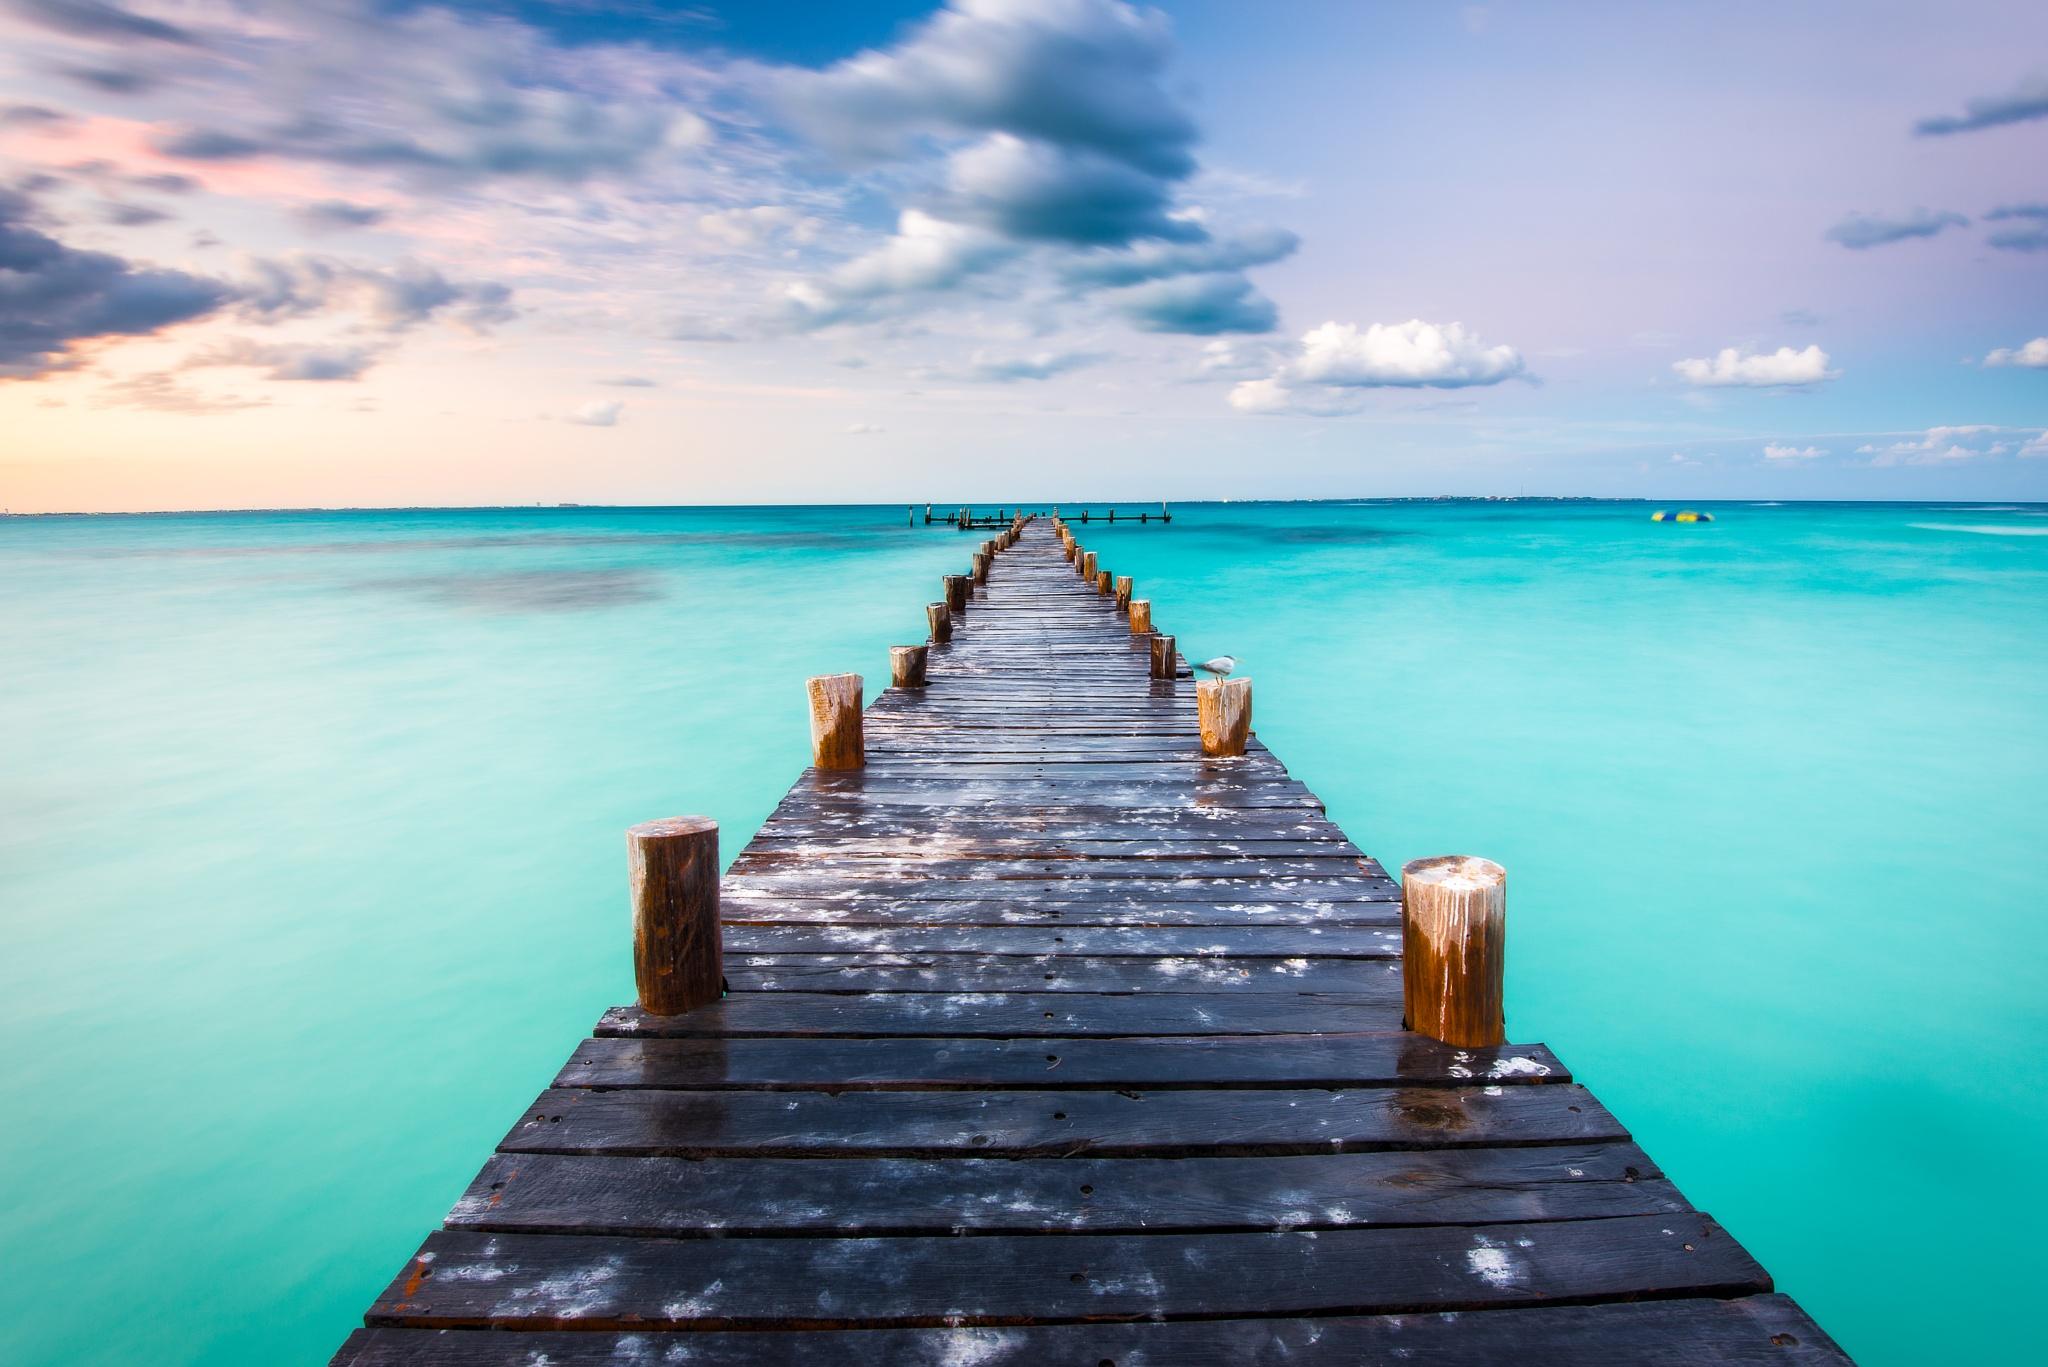 Beach of Caribbean, Cancun by Ian Liu